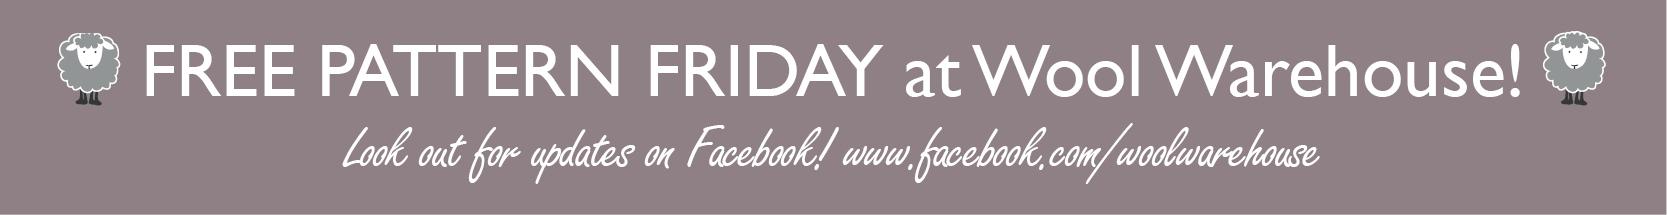 Free Pattern Friday web banner